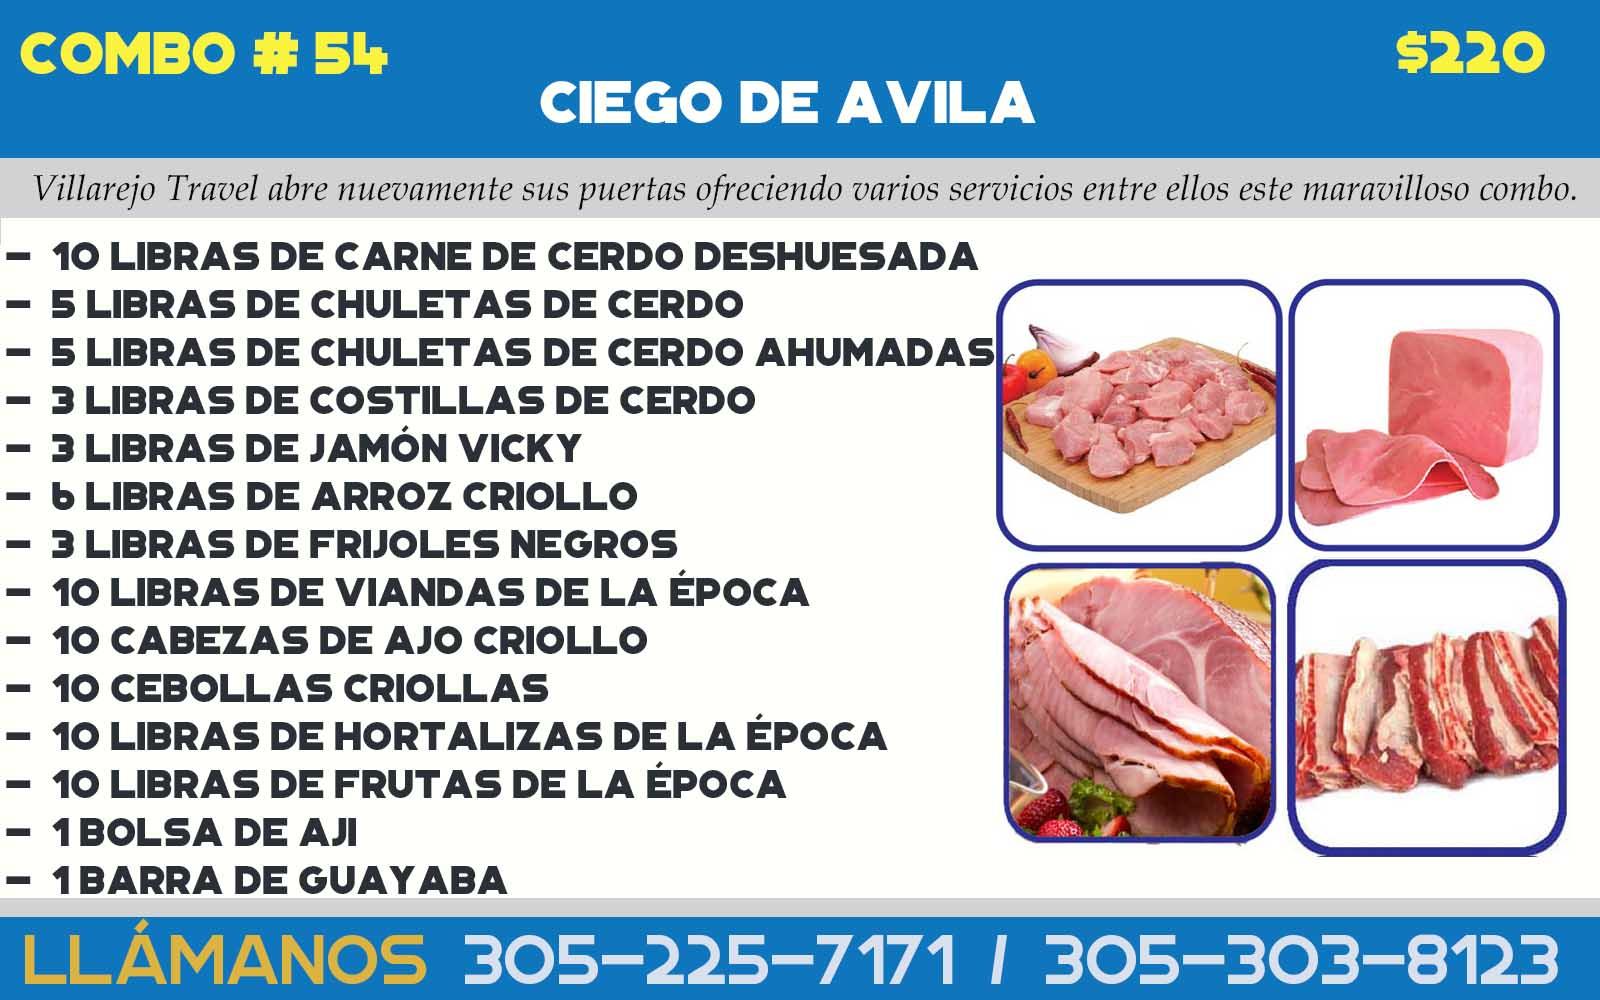 COMBO # 54 PROVINCIA DE CIEGO DE AVILA